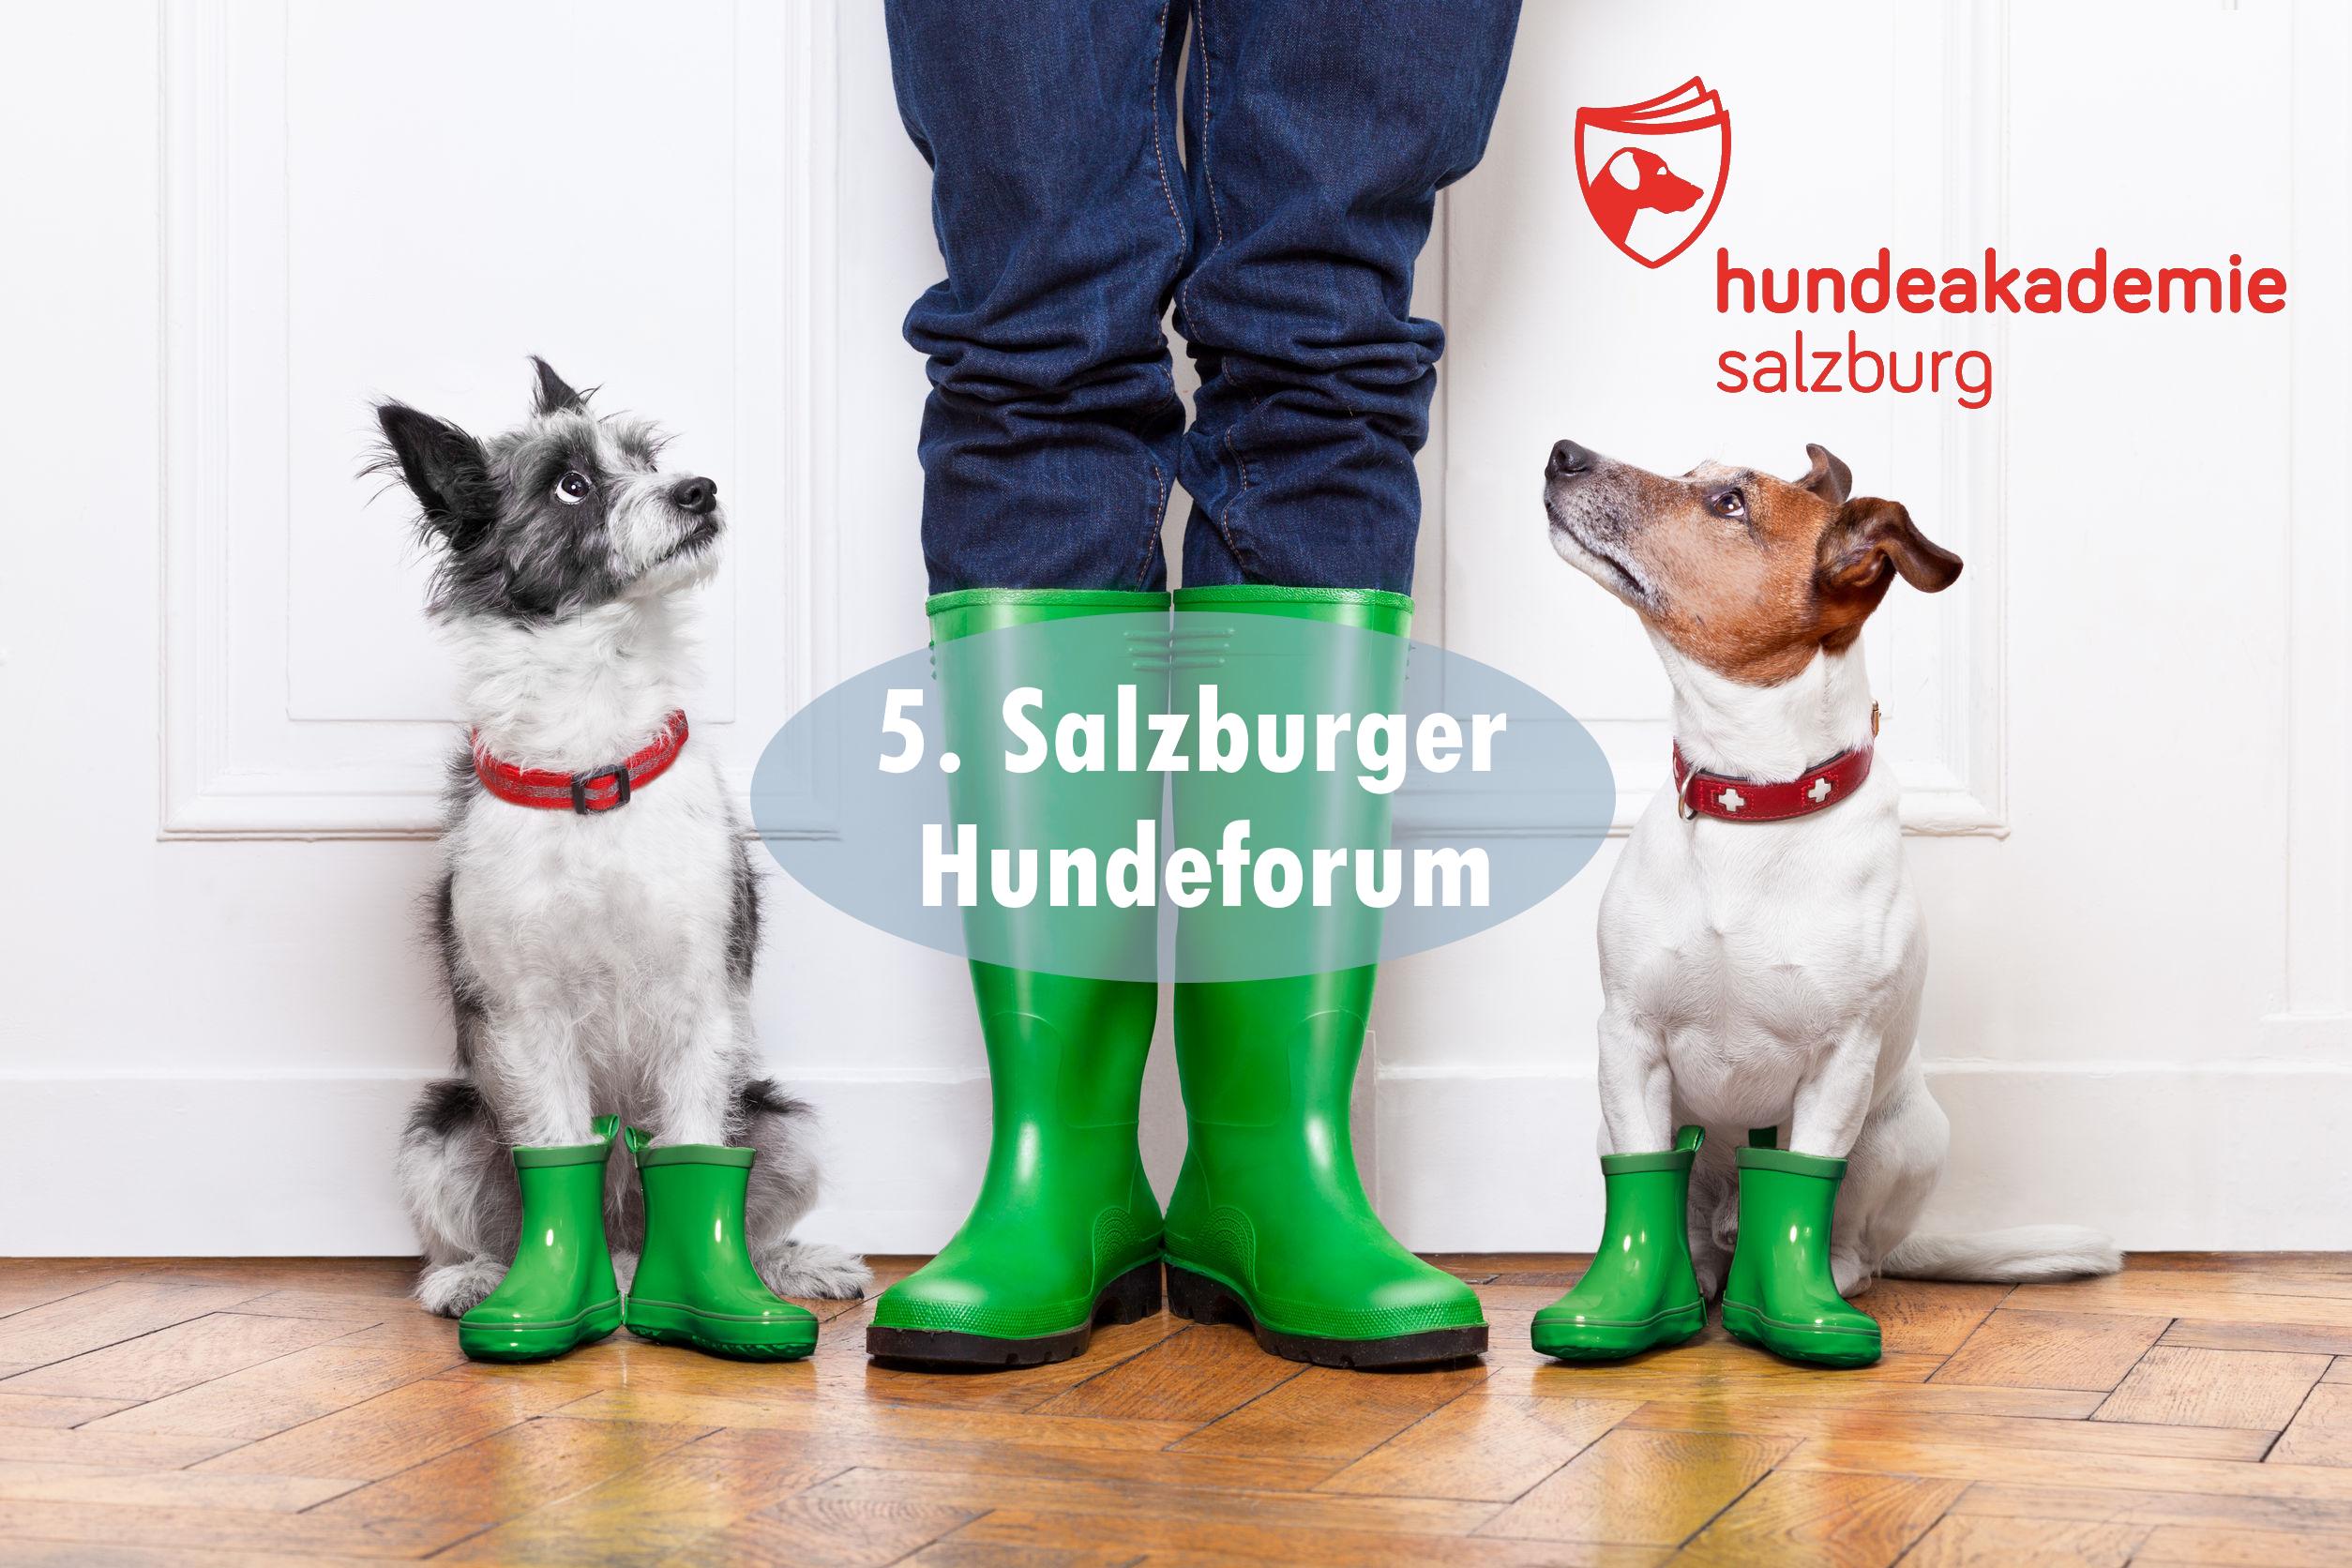 Das 5. Salzburger Hundeforum der Hundeakademie Salzburg 2020